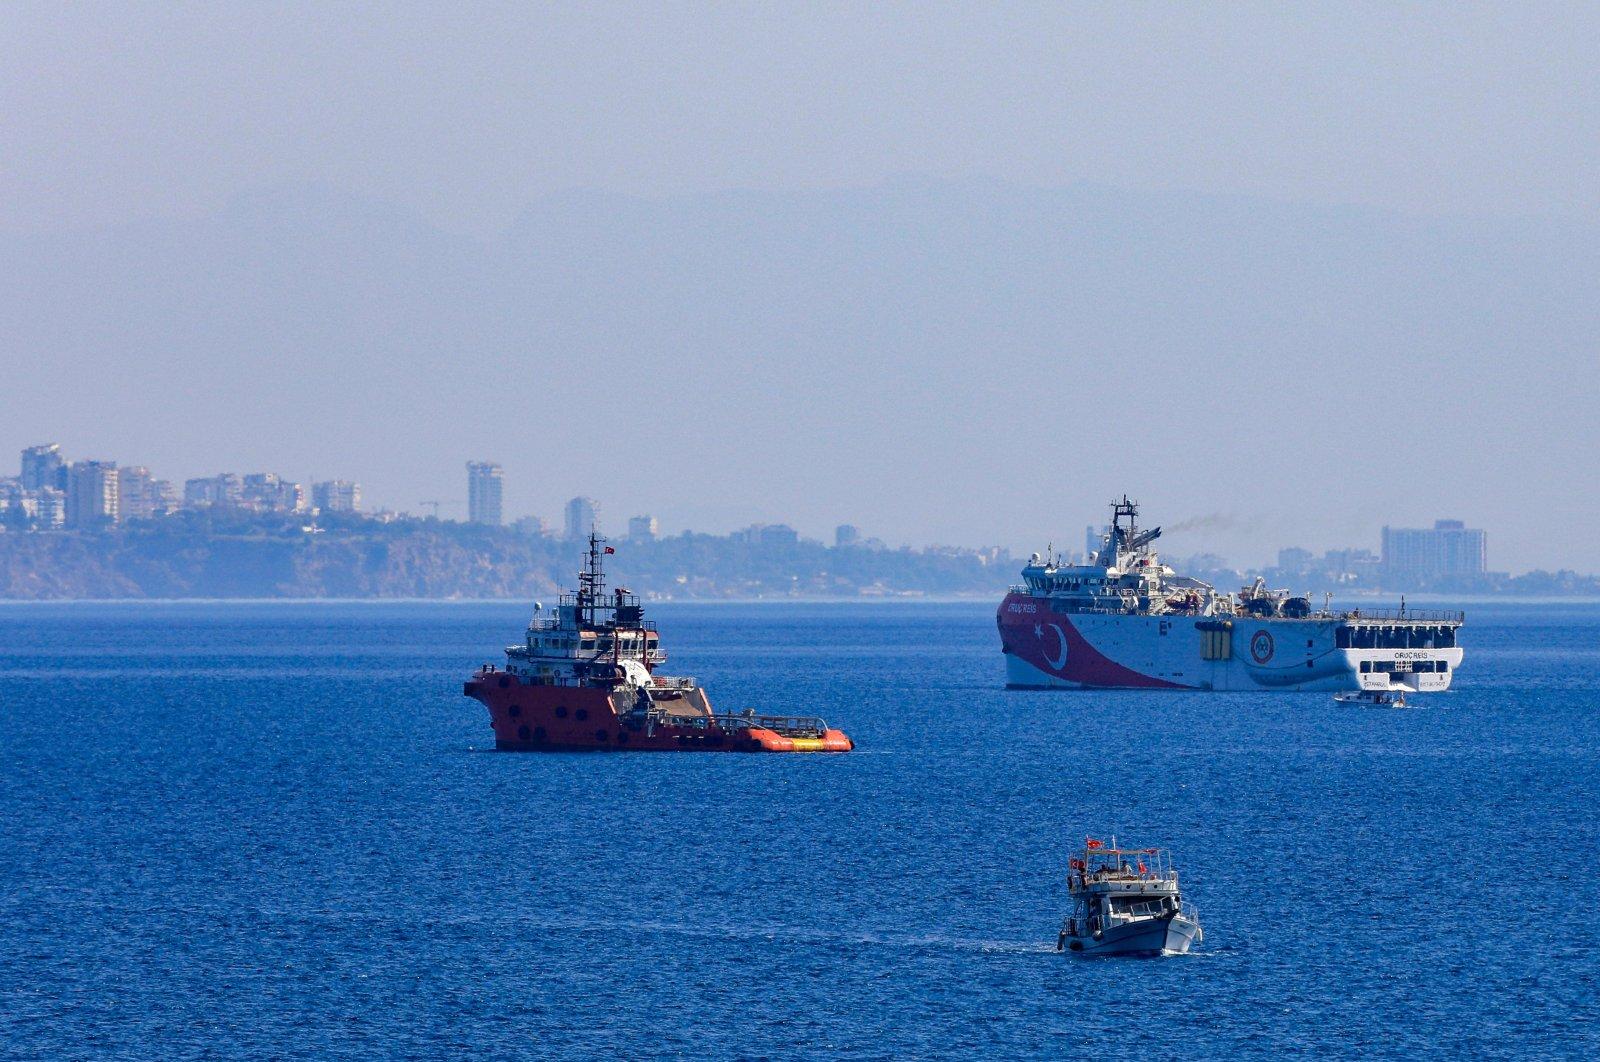 Turkey's drilling vessel Oruç Reis leaves the port of Antalya, Turkey, Oct. 4, 2020. (DHA Photo)